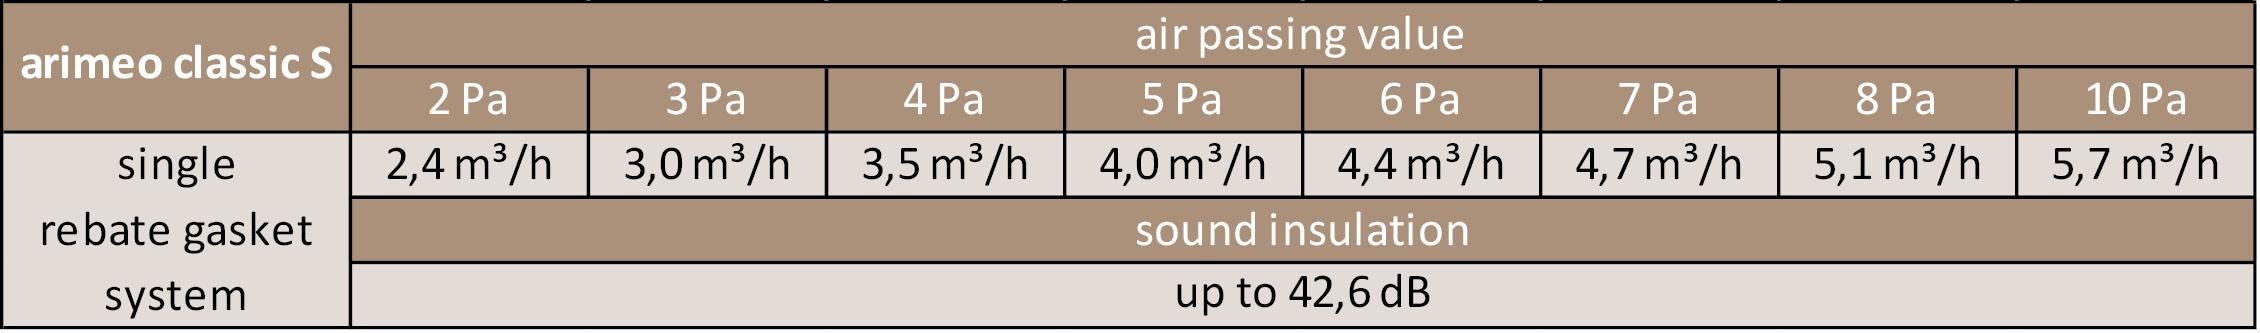 arimeo classic S performance data single